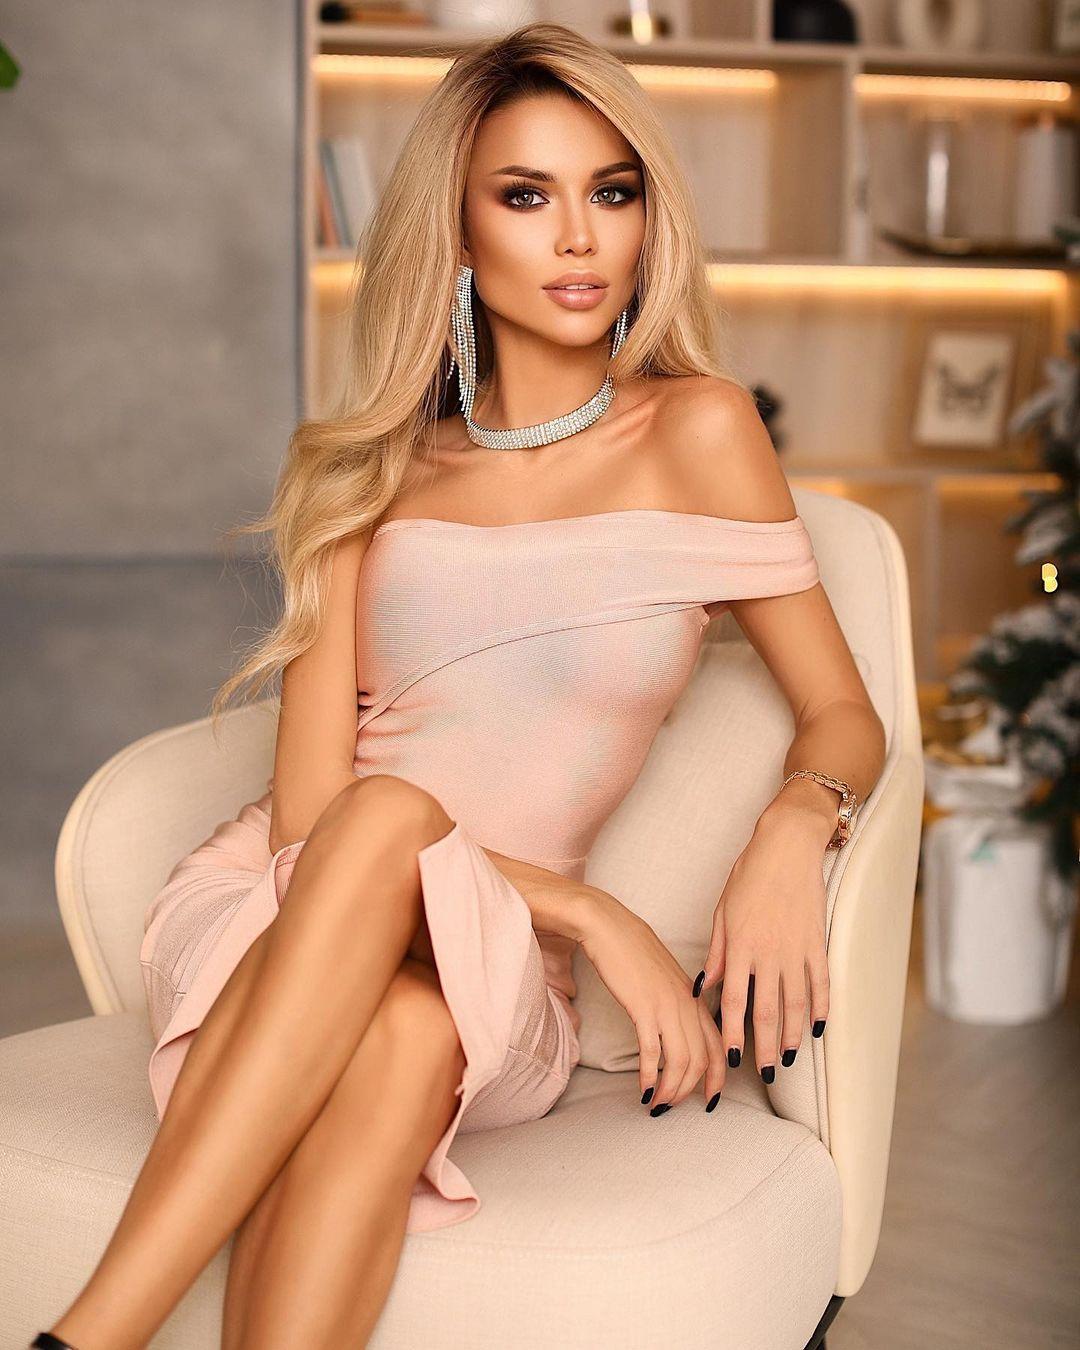 Anastasiya-Timonina-Wallpapers-Insta-Fit-Bio-8